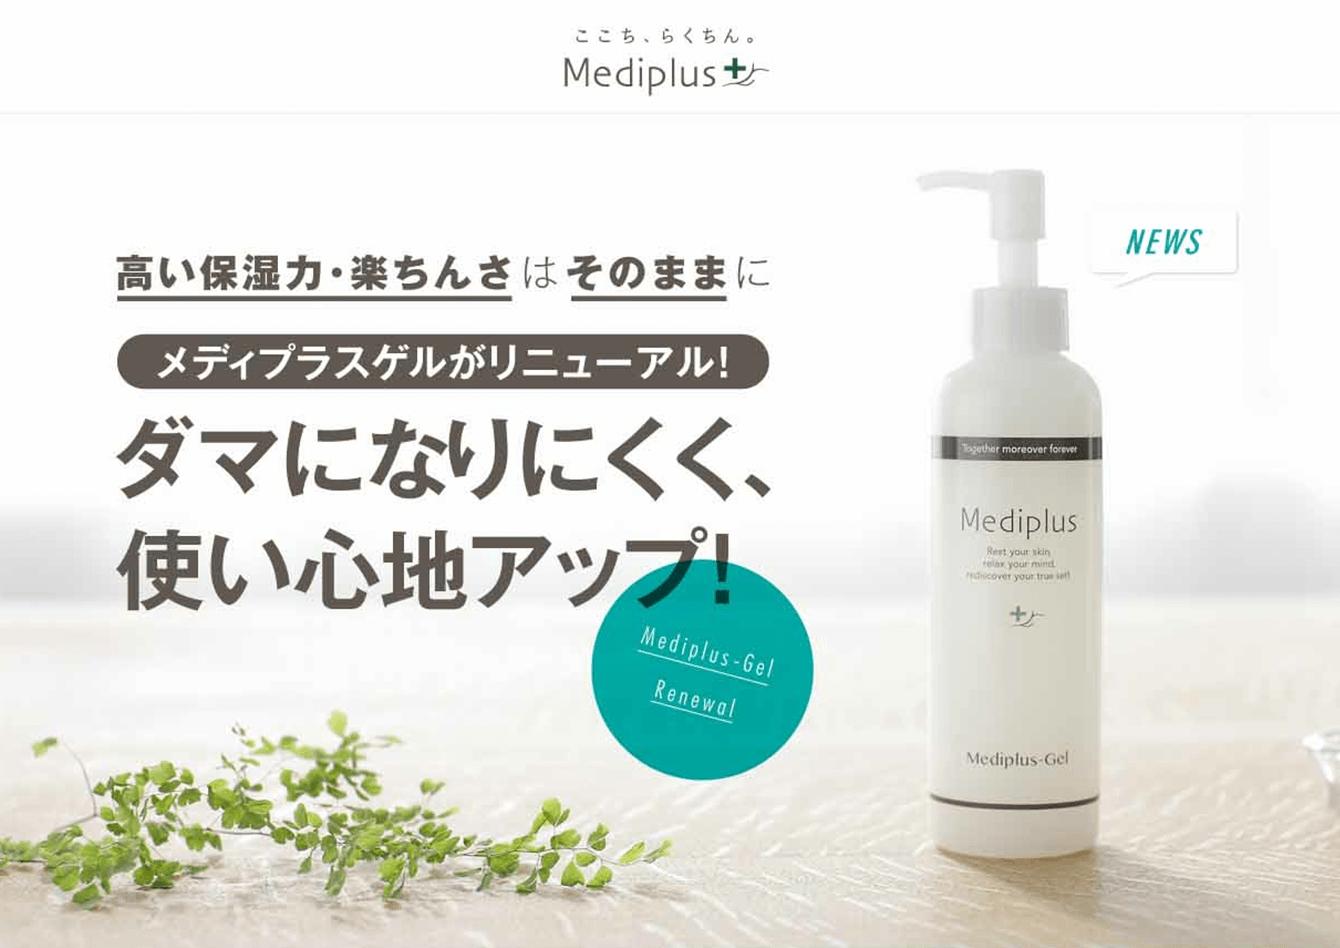 Mediplus:WEB SITE